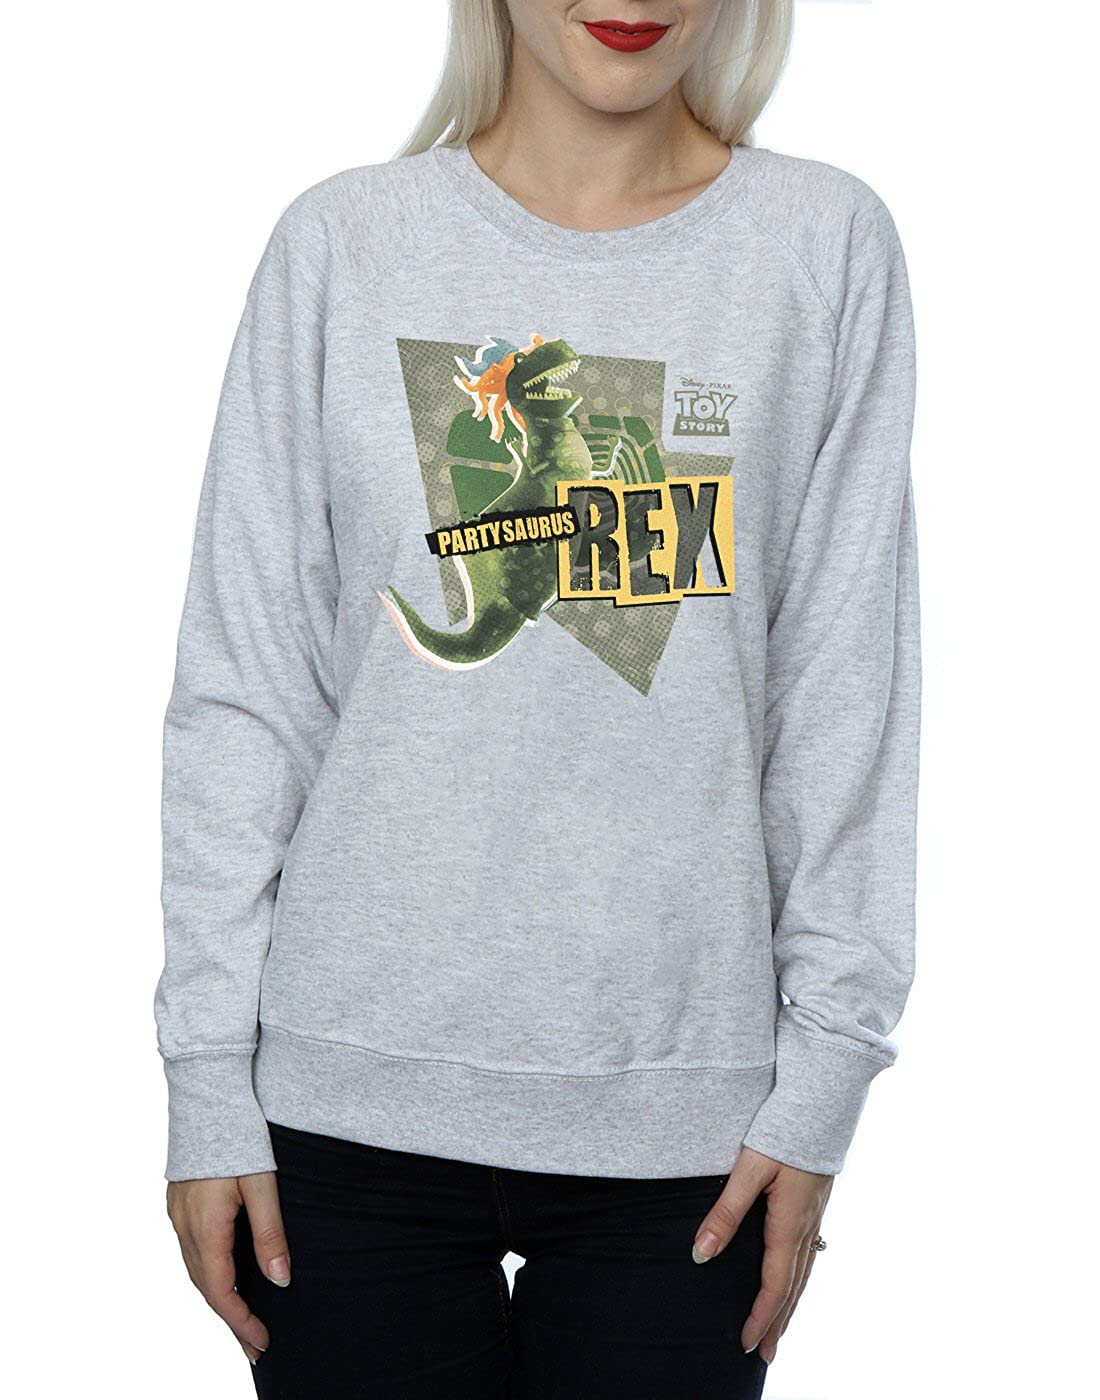 e69f5cbe5cc Amazon.com  Disney Women s Toy Story Partysaurus Rex Sweatshirt  Clothing